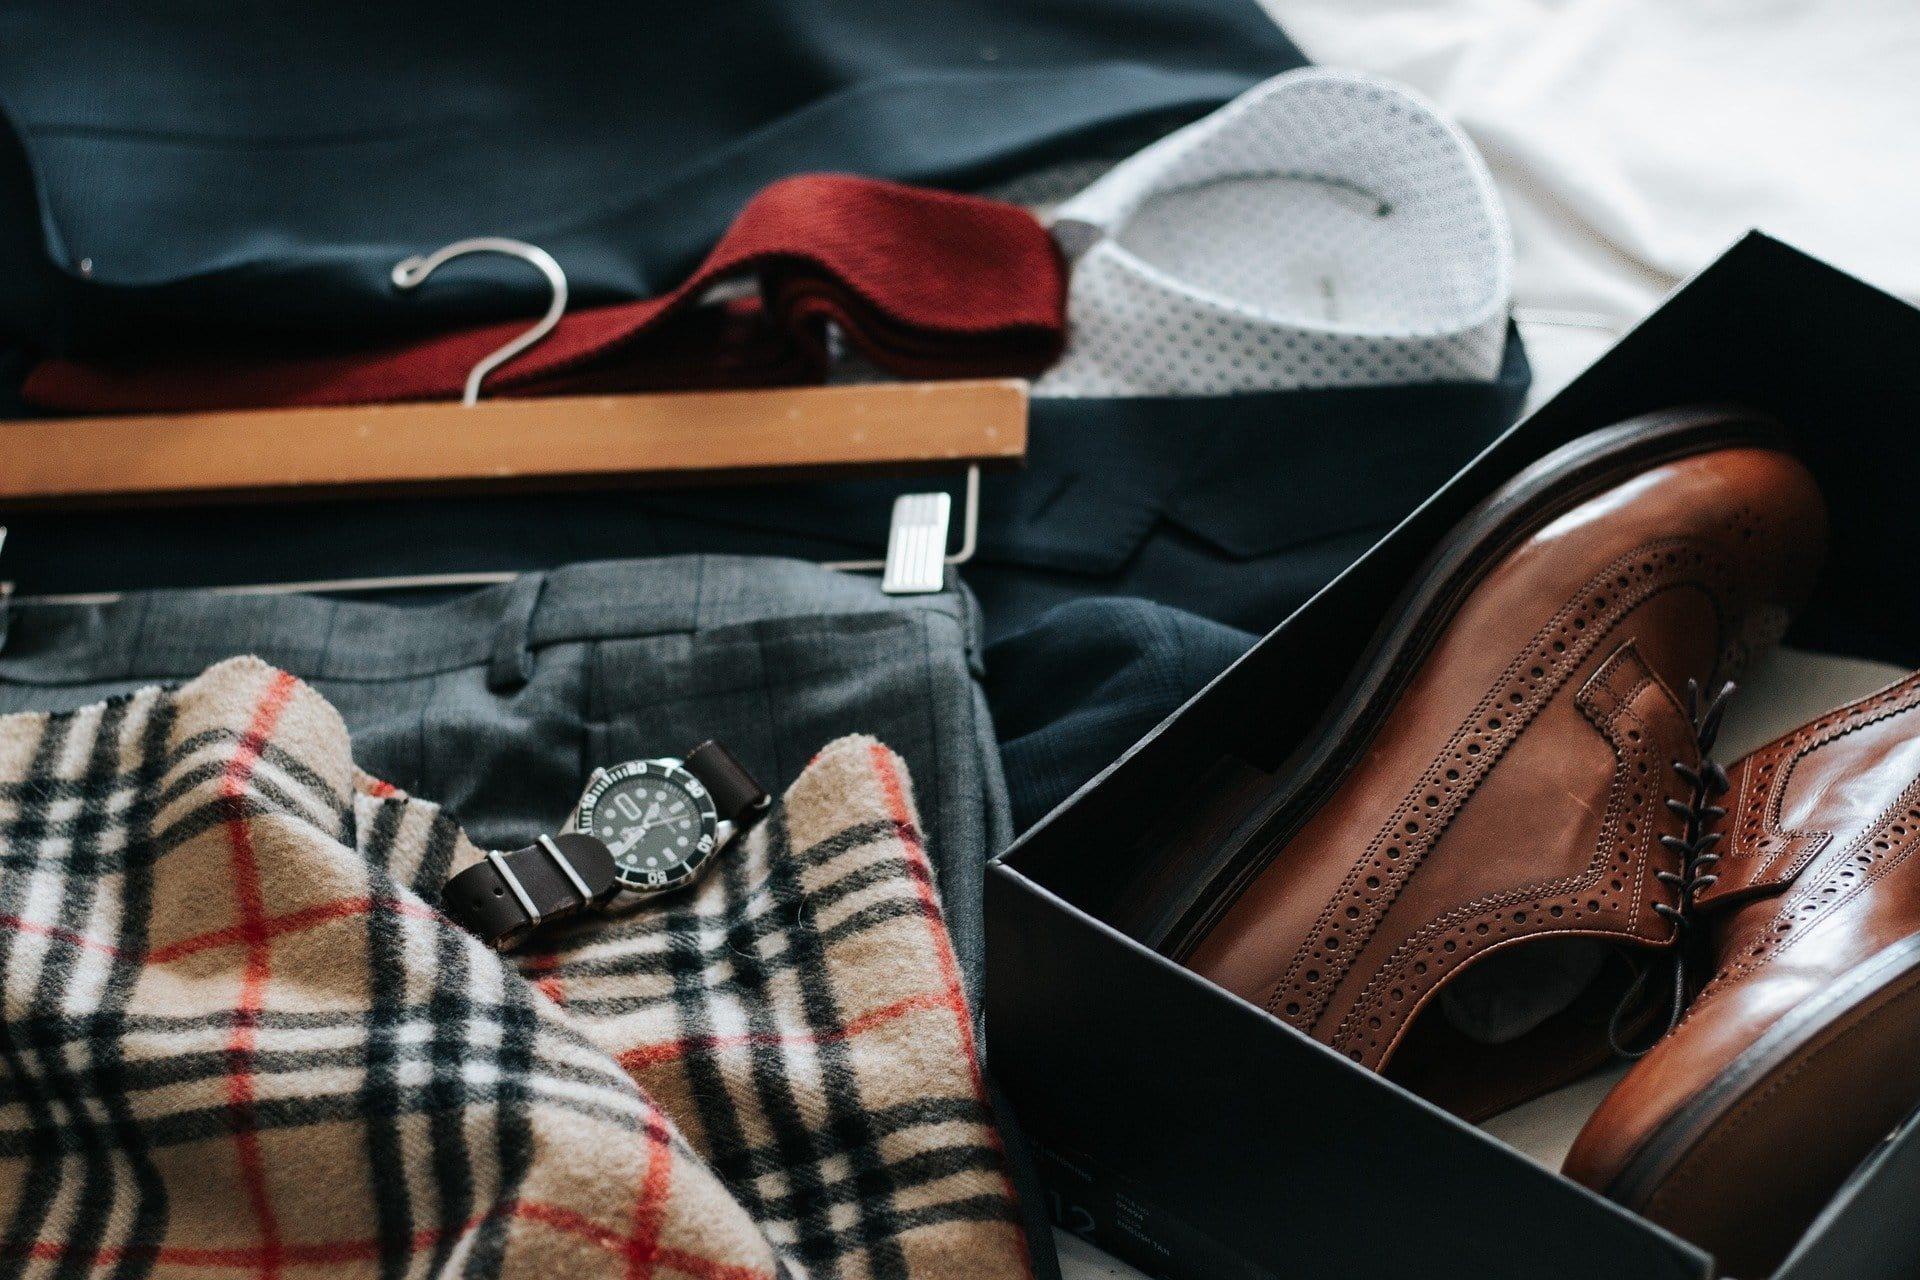 Interview Lebensstil Kleidung Männer Mode Burberry - (c) Pixabay